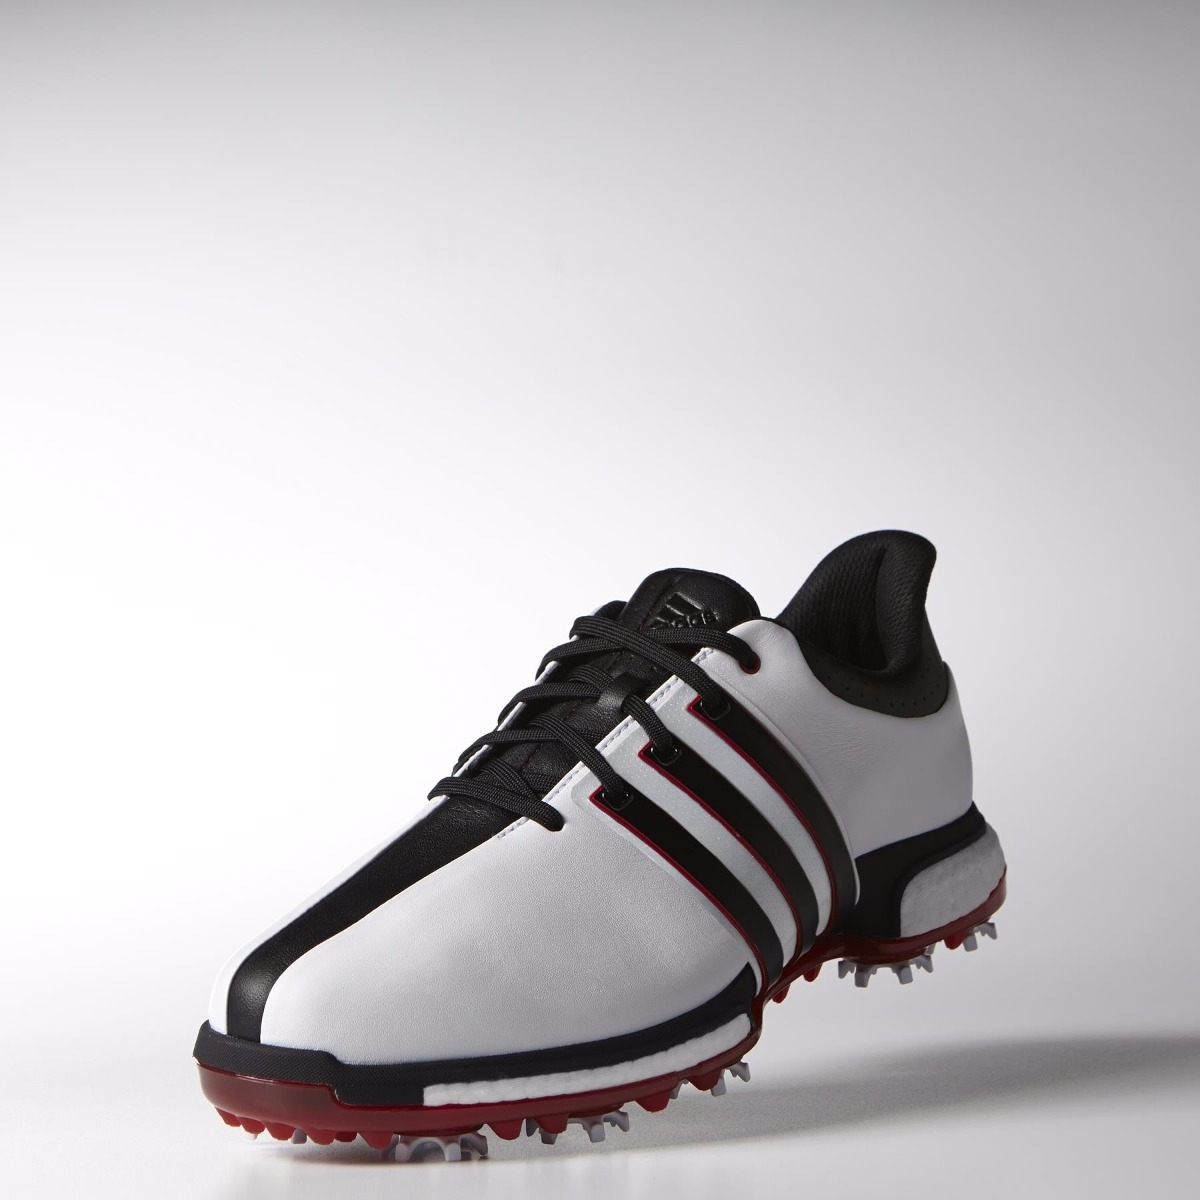 2adidas zapatos golf